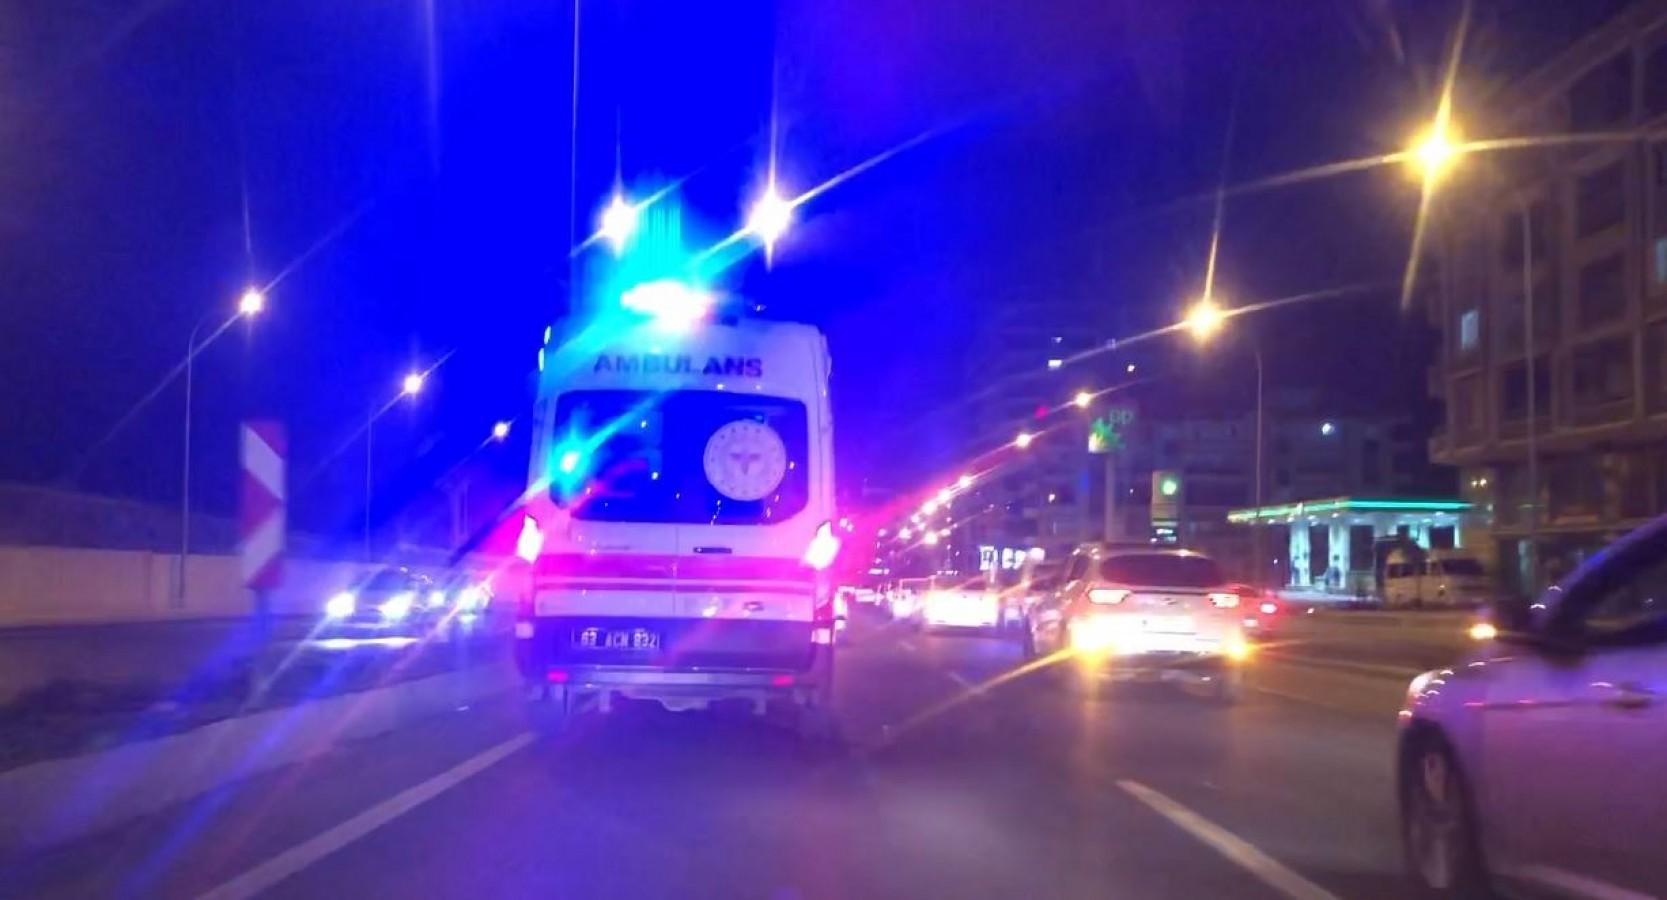 Urfa'da düğün konvoyu ambulansa geçit vermedi!